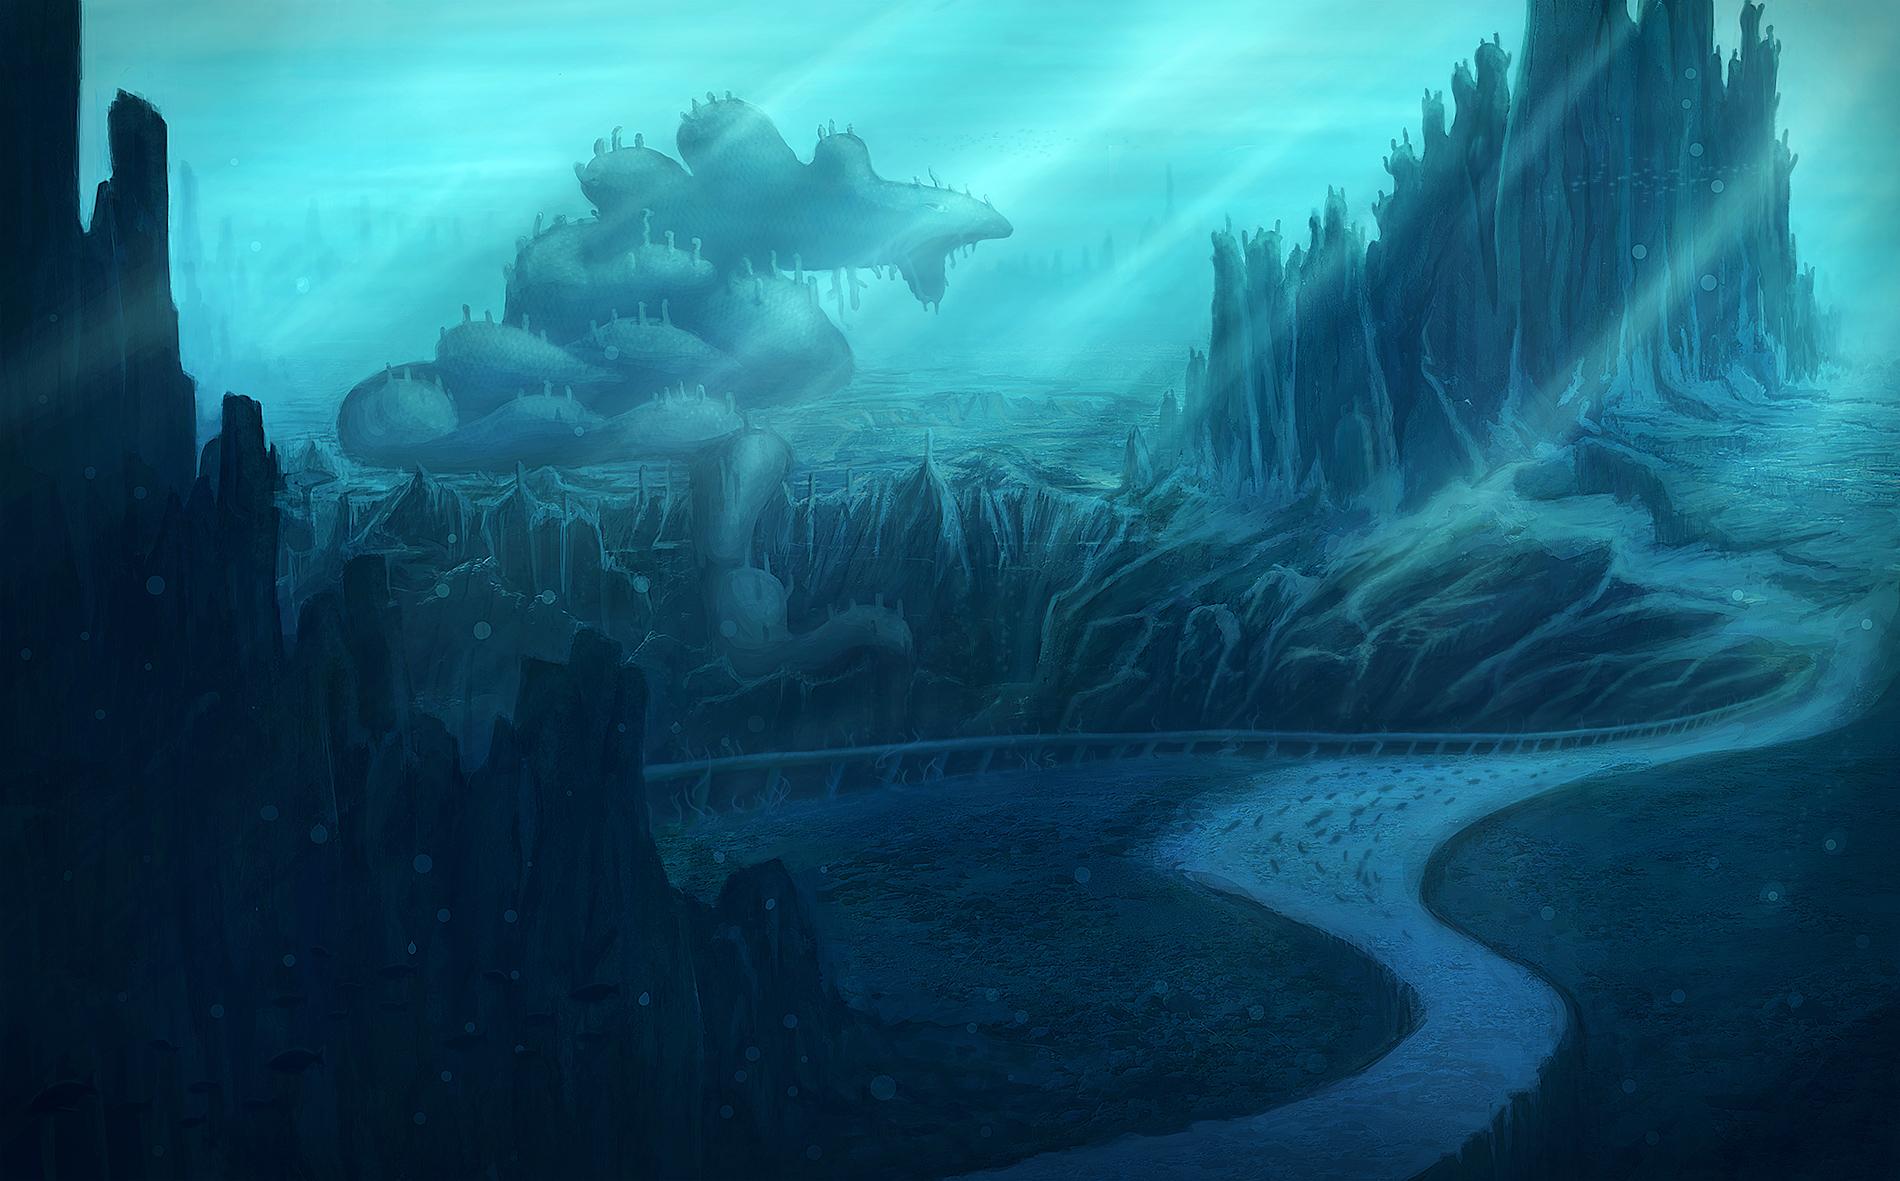 Deep Sea Landscape Concept by AlexBostone on DeviantArt